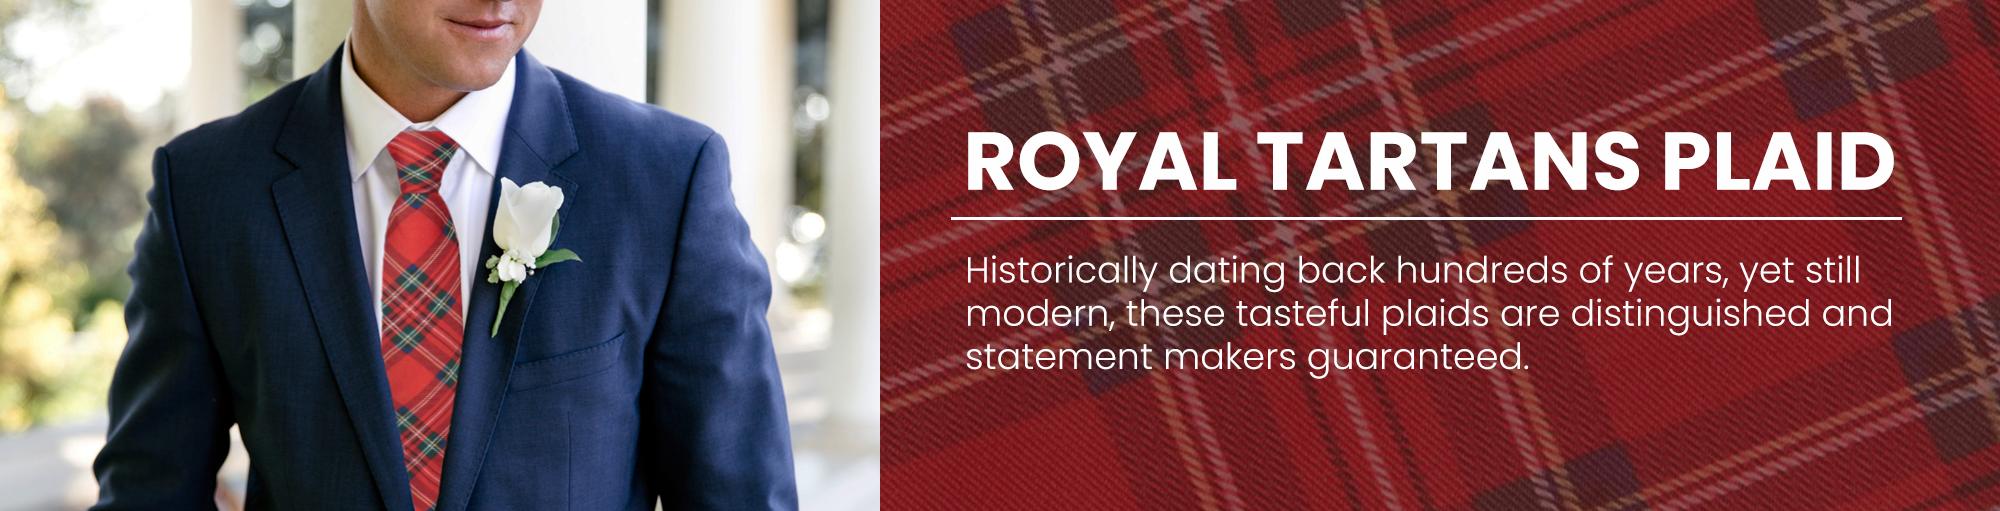 Royal Tartans Plaid